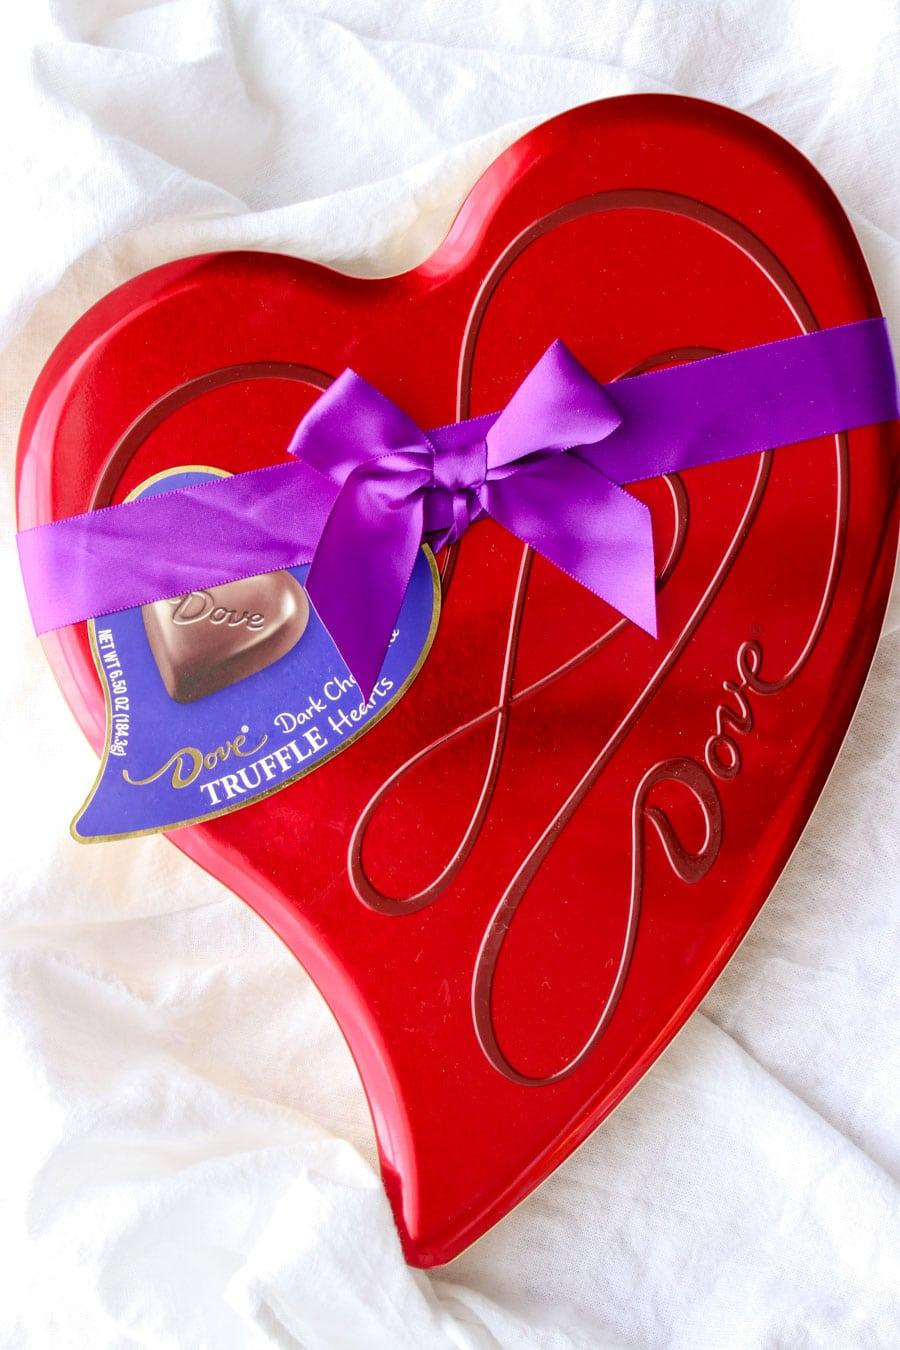 Heart shaped DOVE candy box